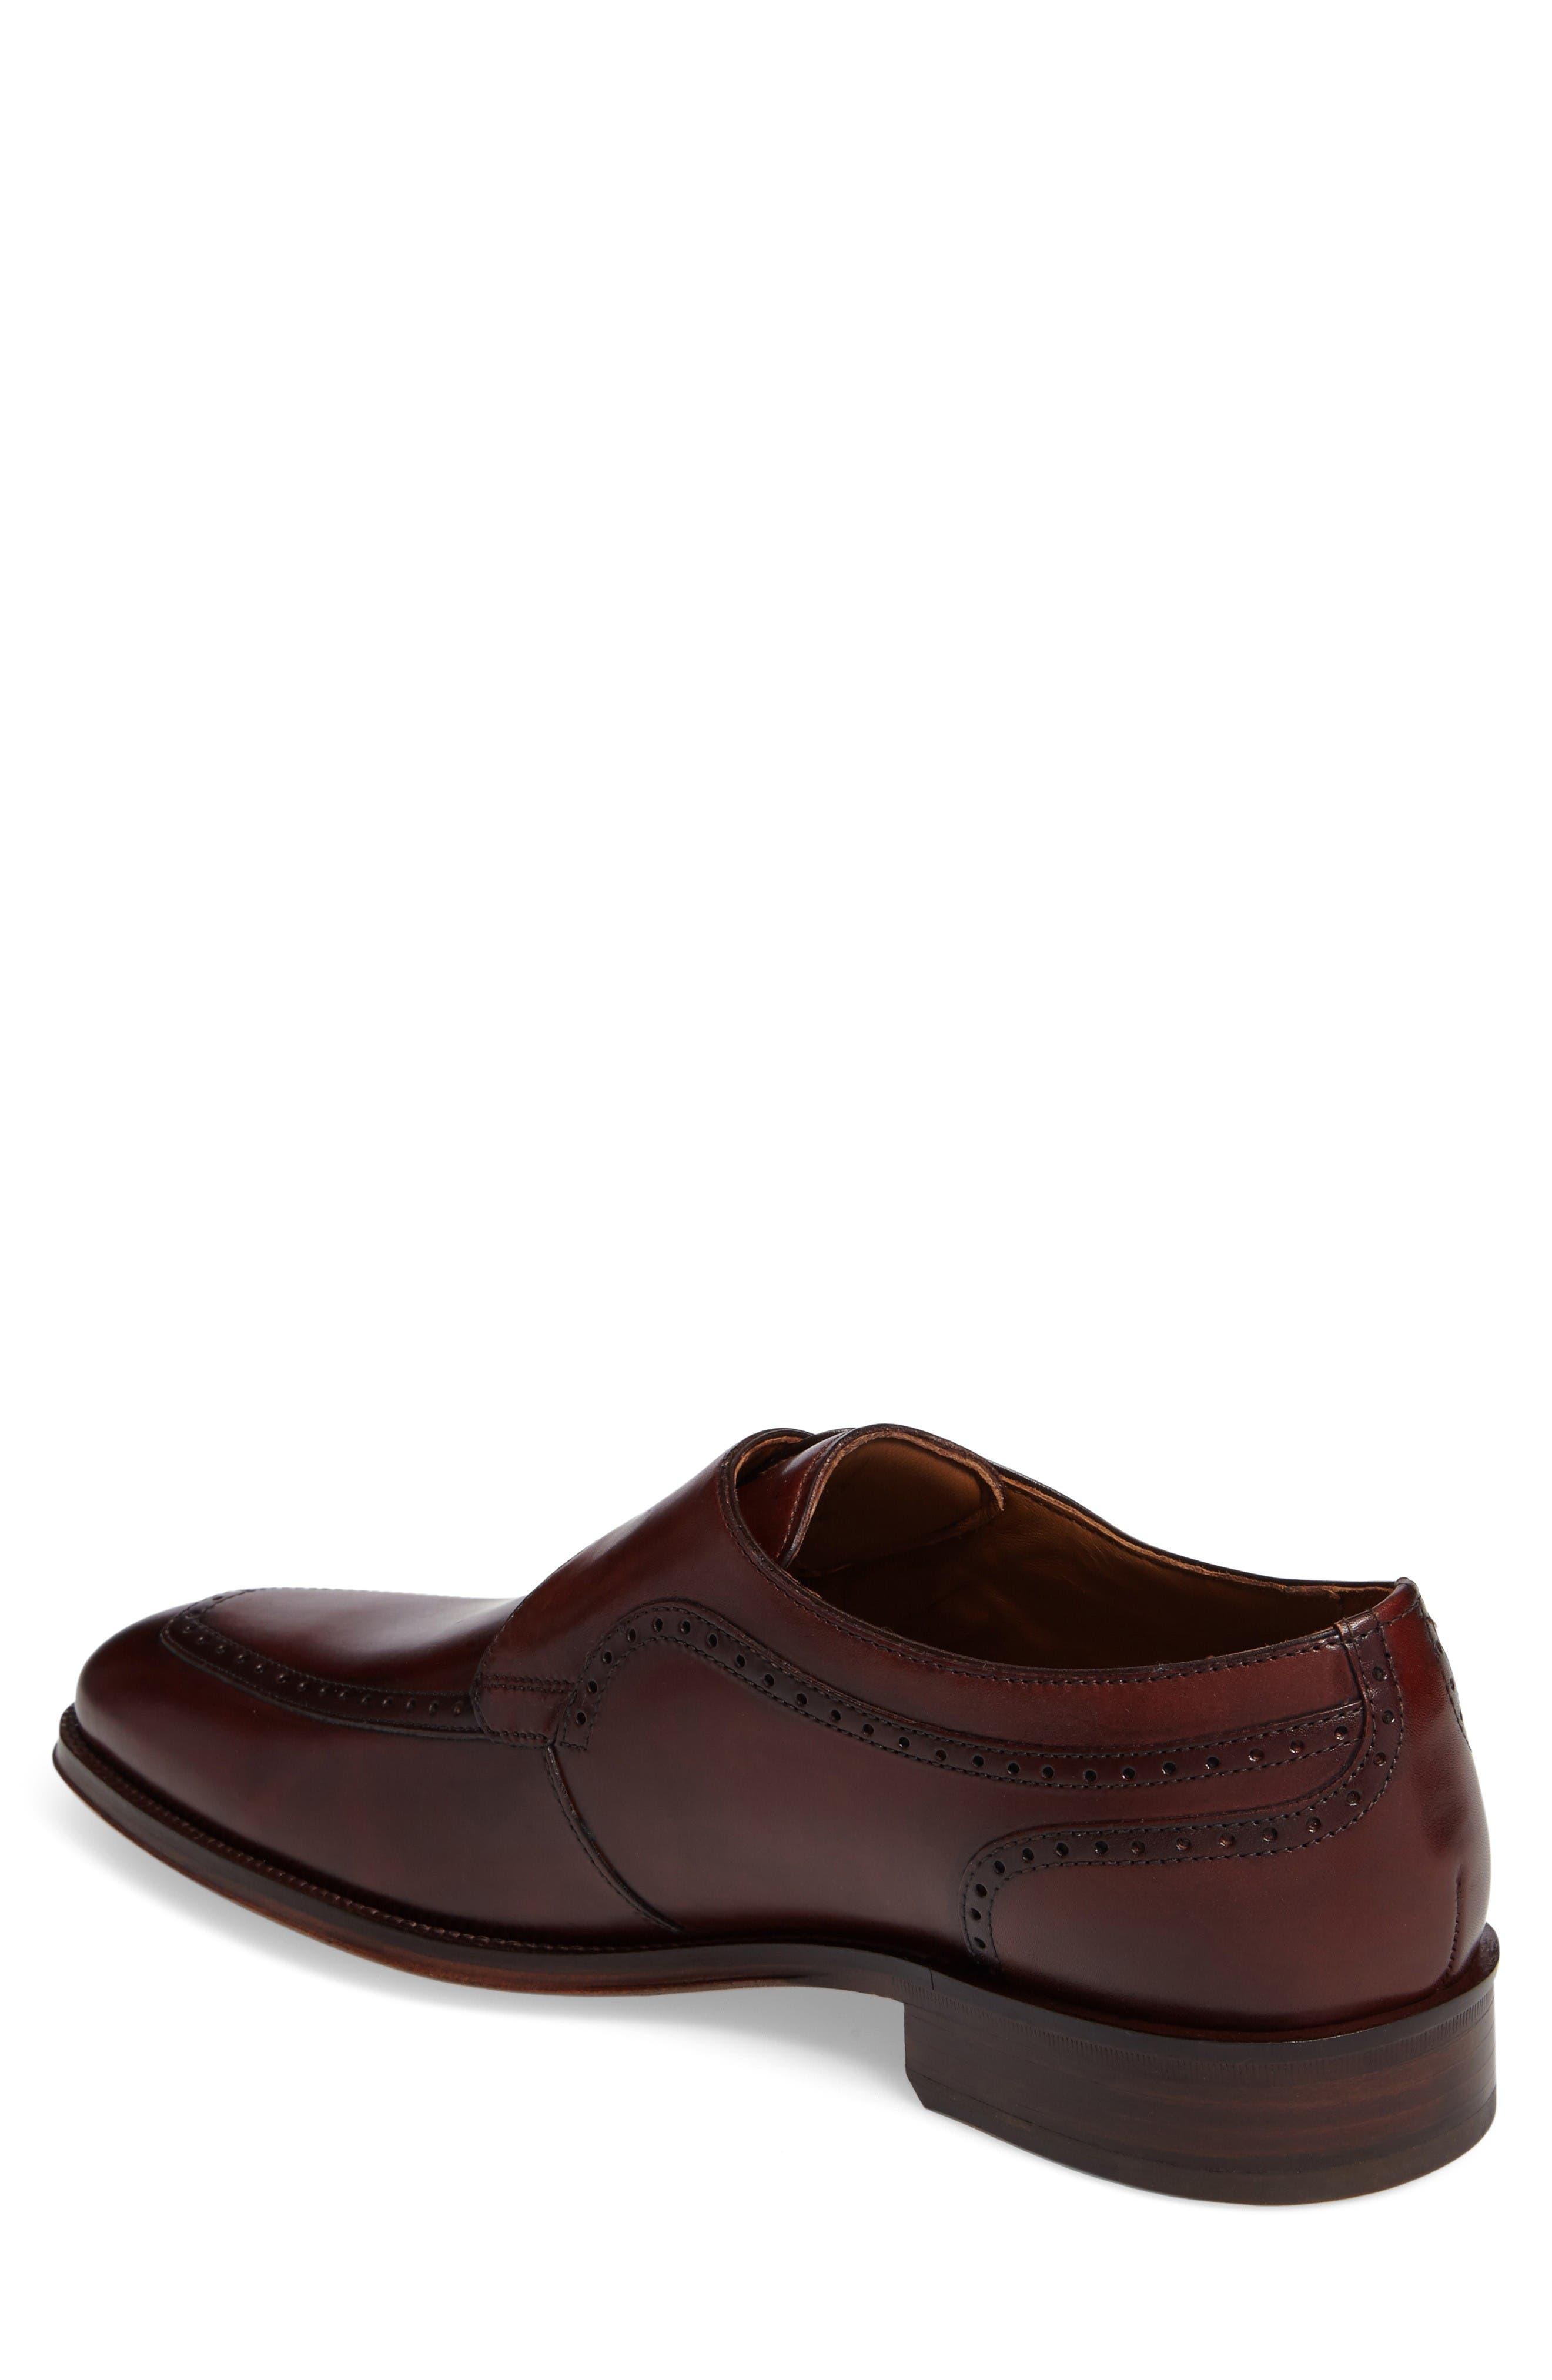 Alternate Image 2  - Johnston & Murphy Boydstun Monk Strap Shoe (Men)